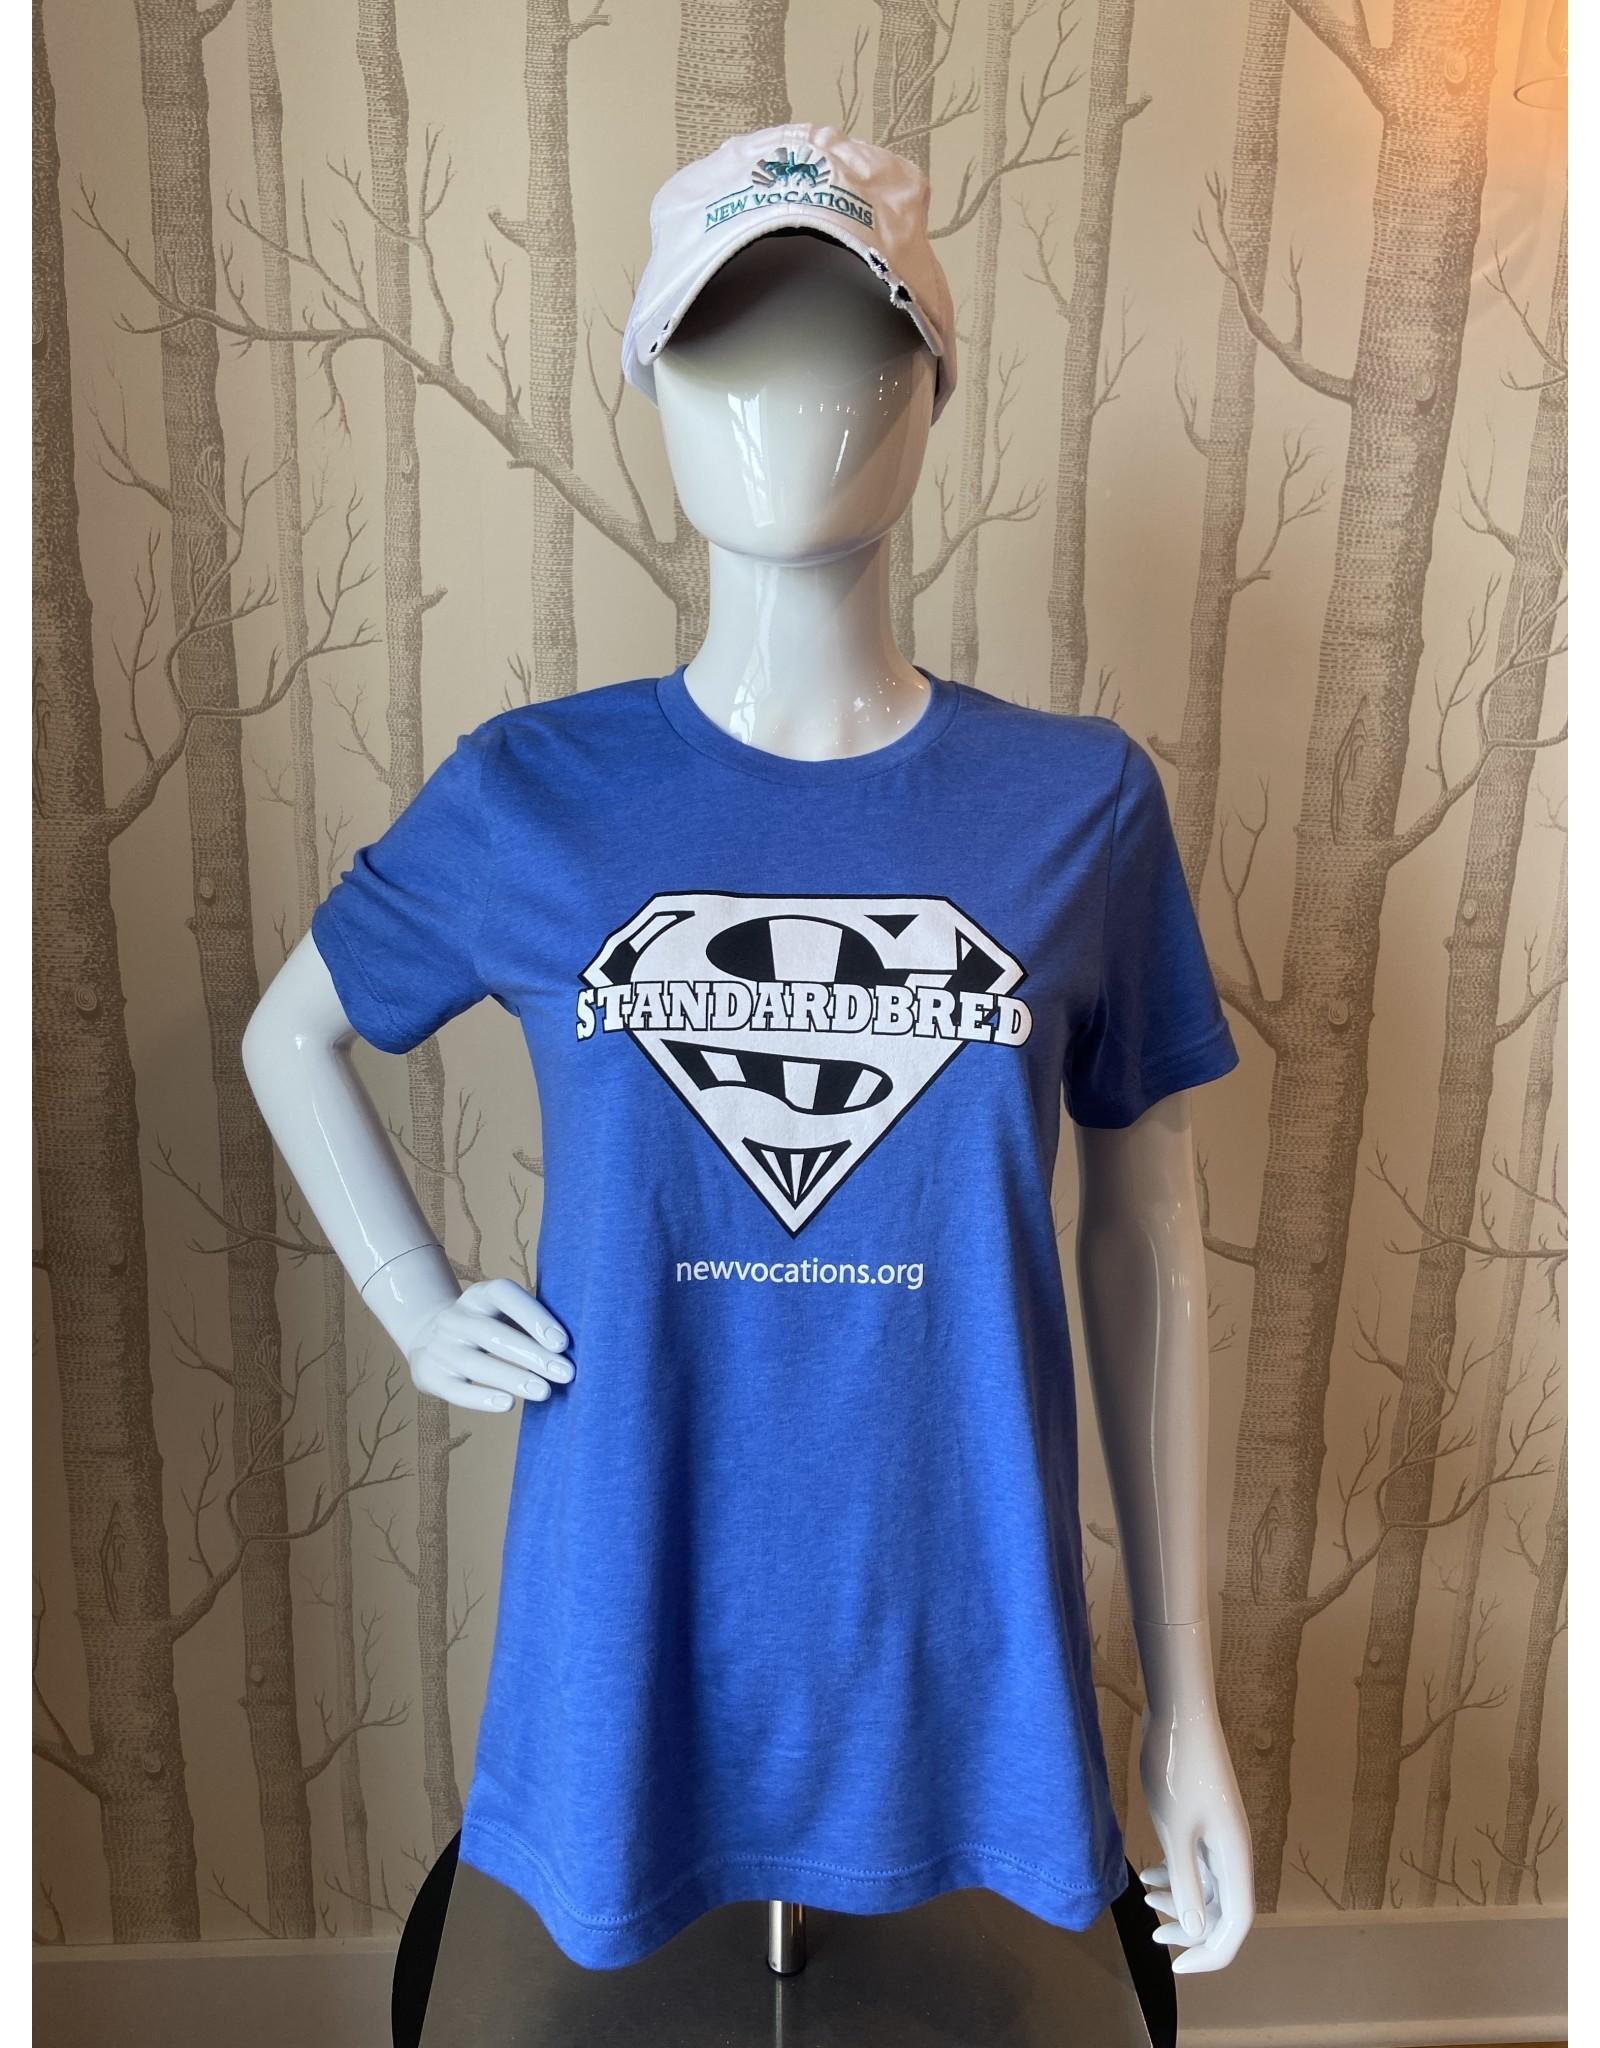 Super Standardbred T-Shirt